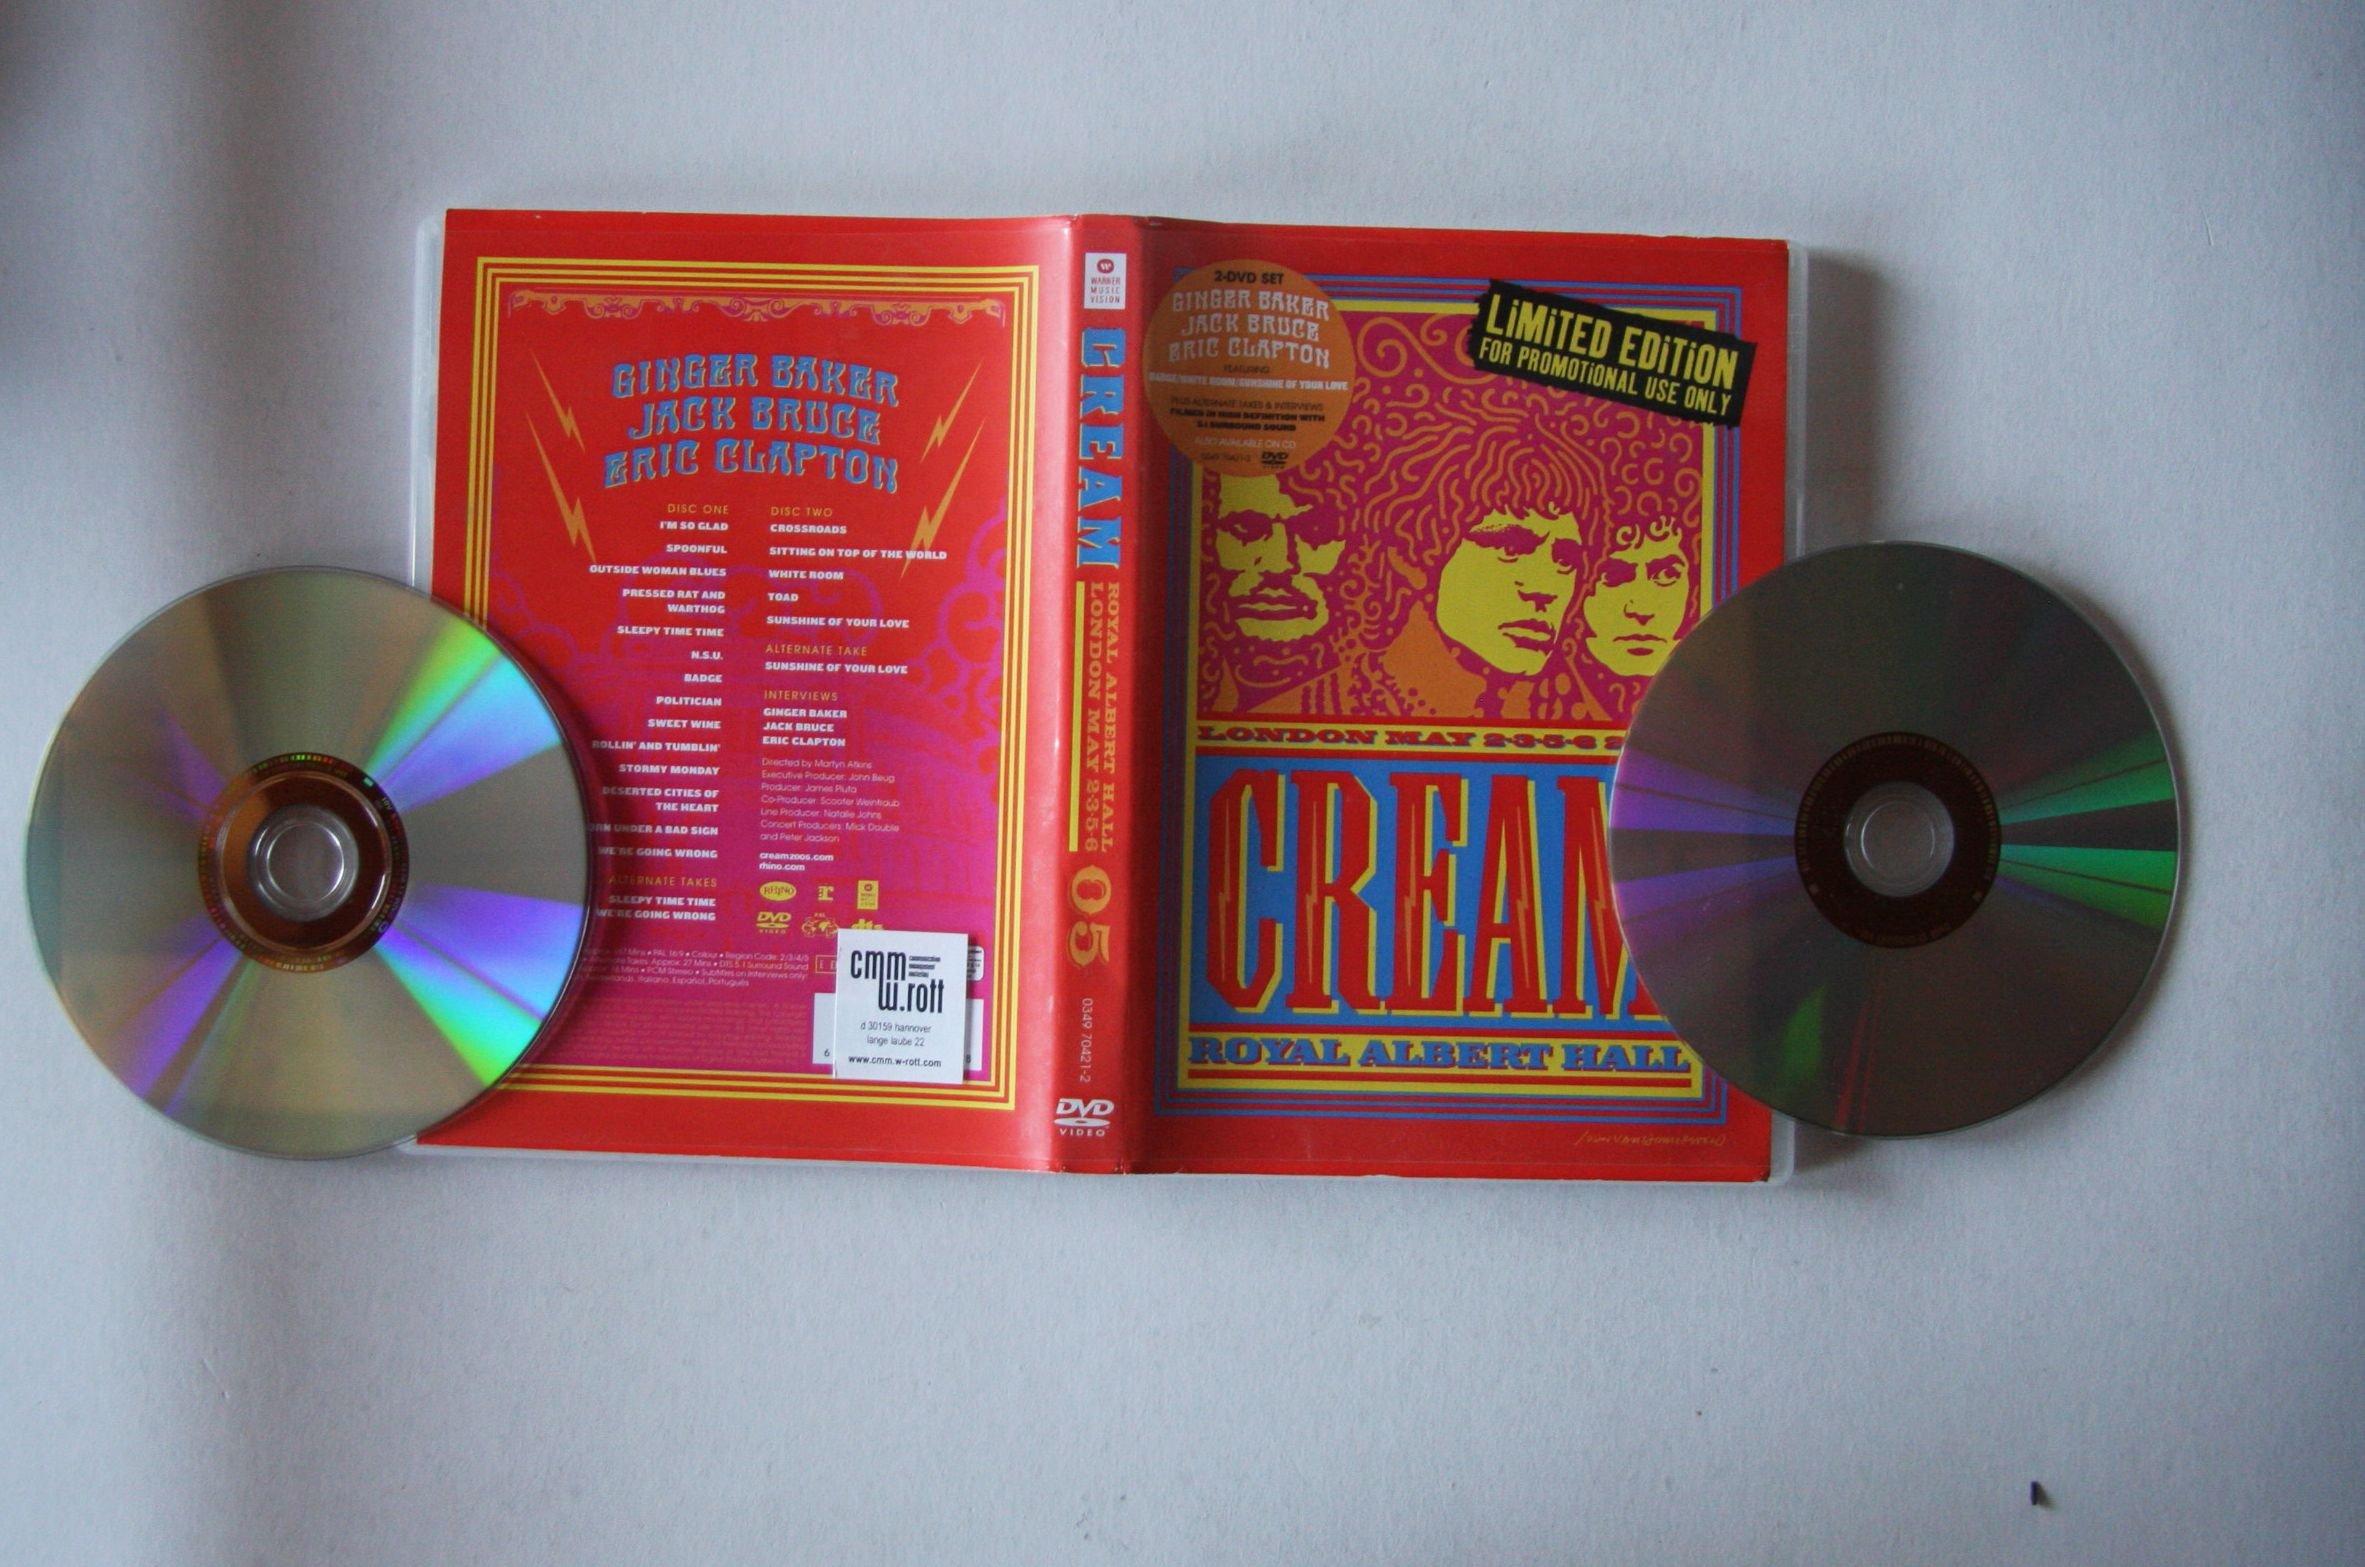 Cream - Royal Albert Hall - London - May 2-3-5-6 05